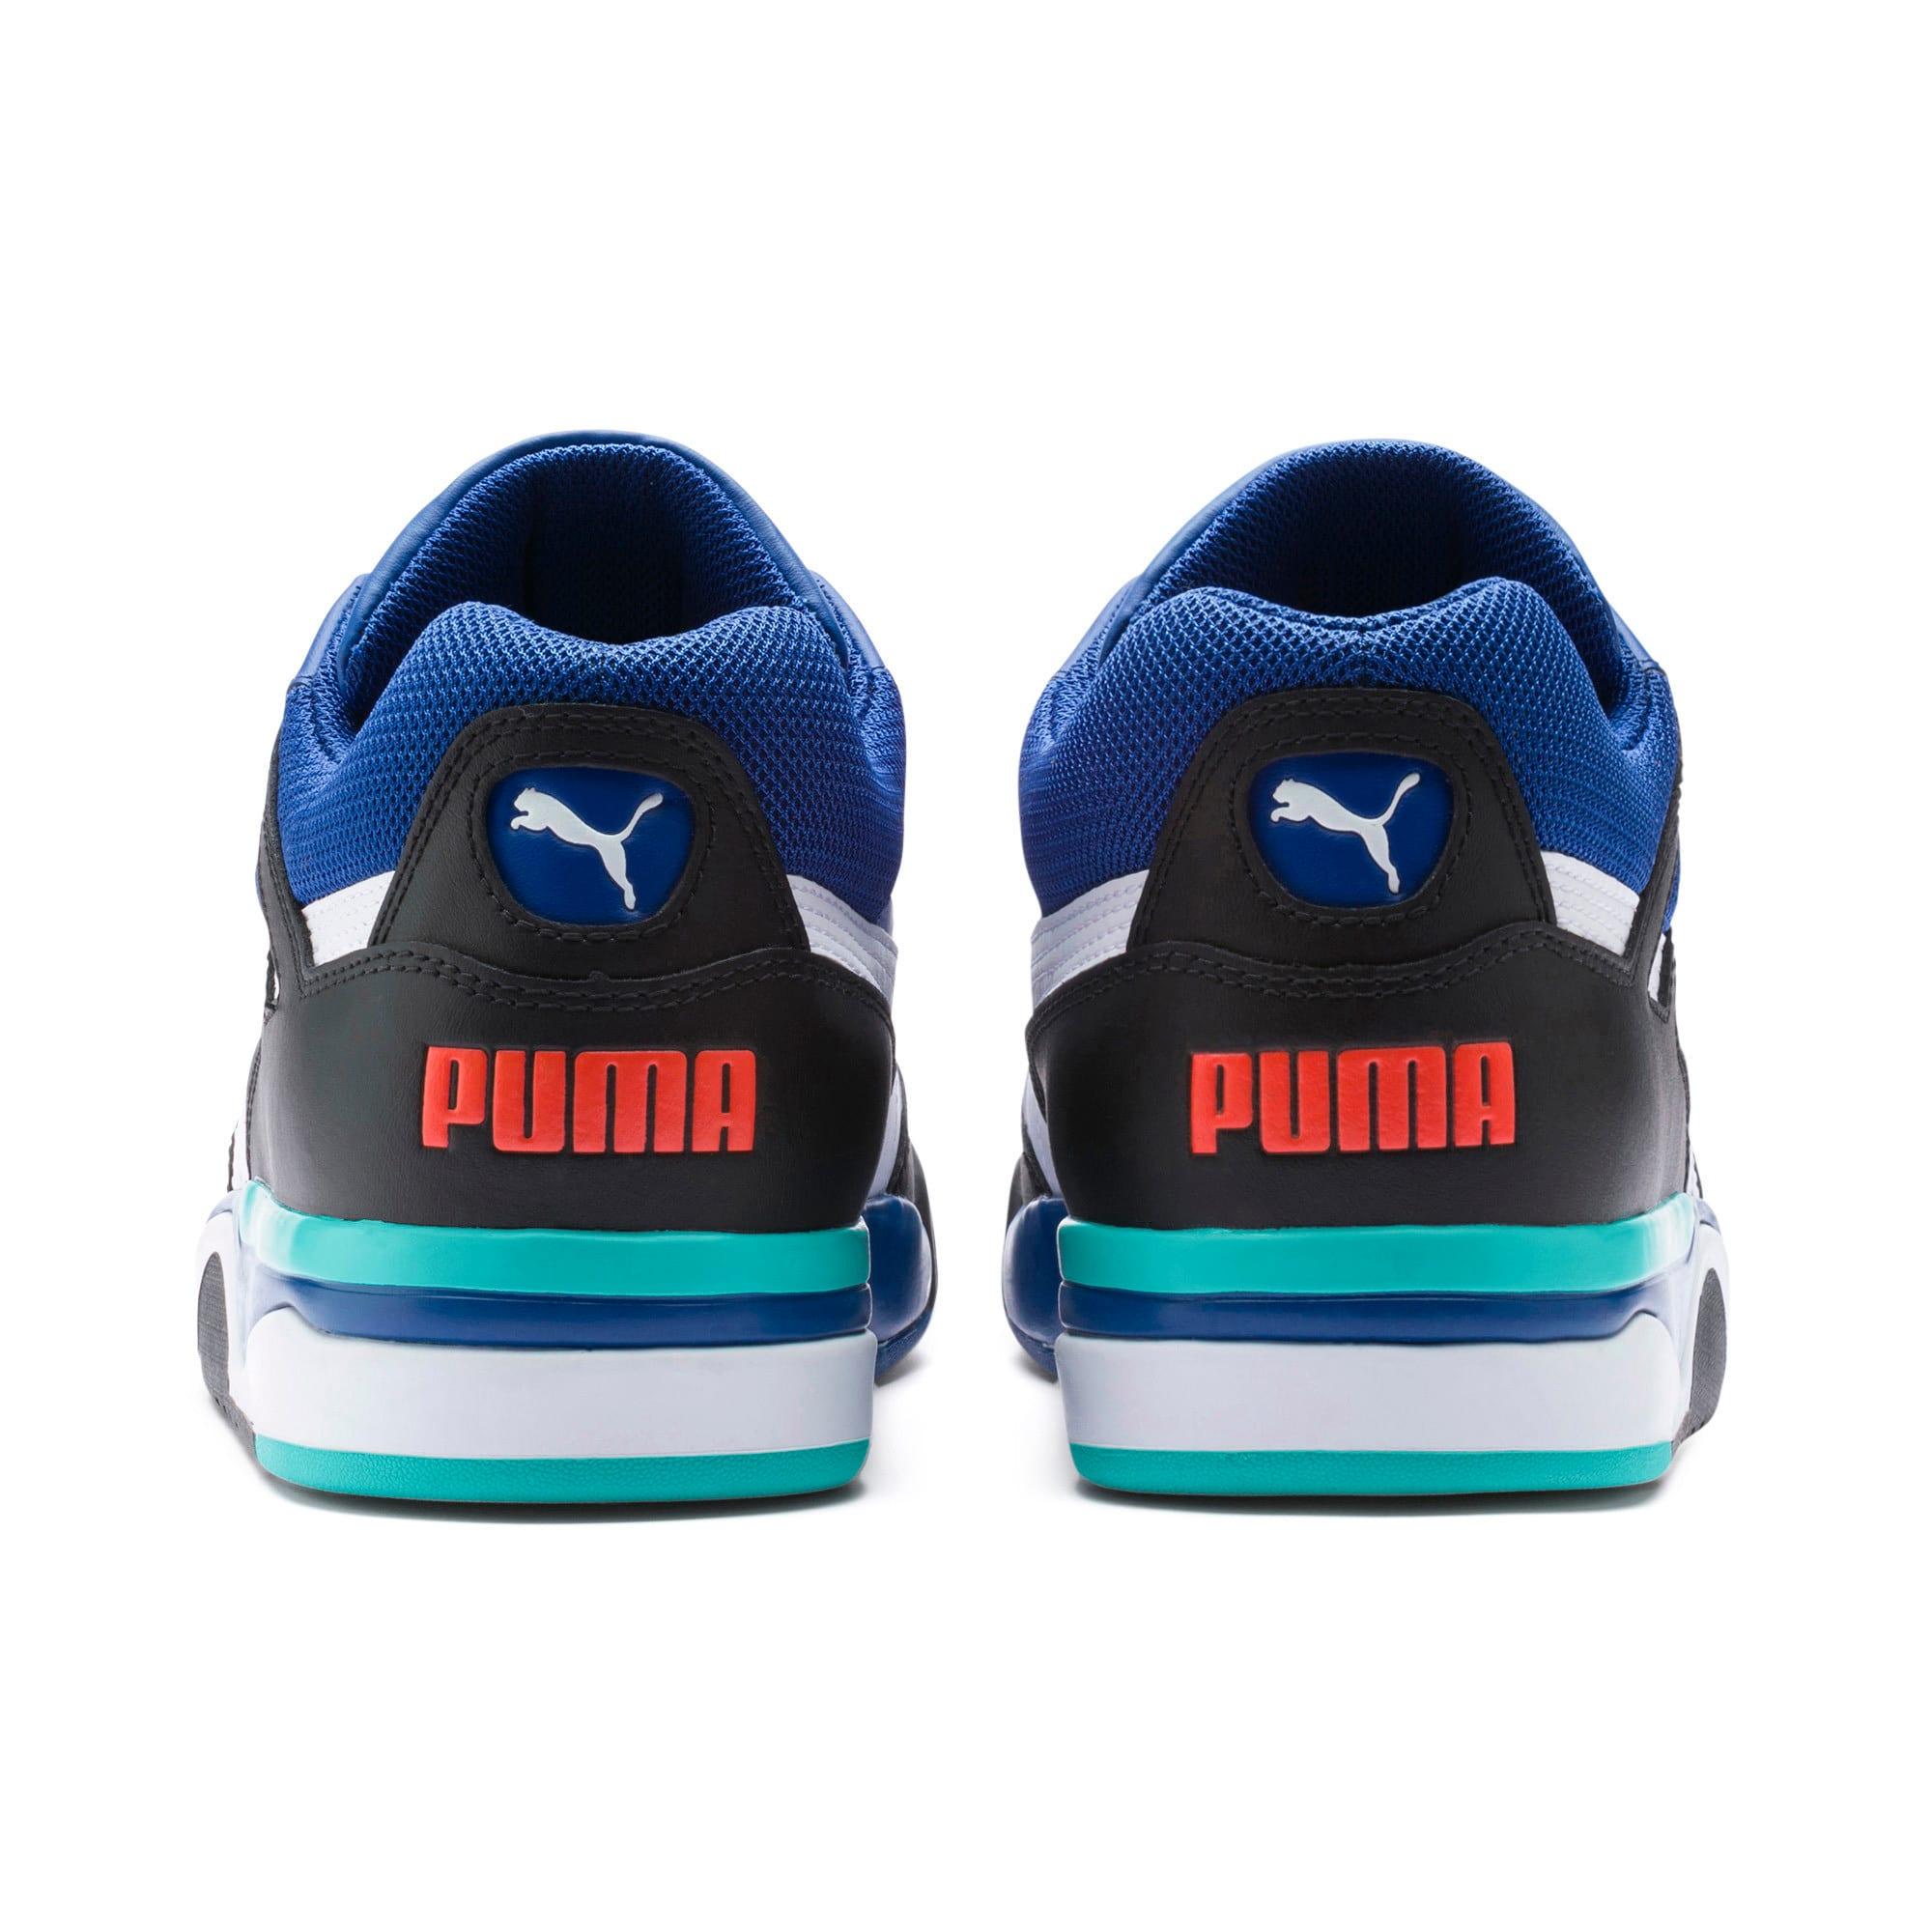 Thumbnail 3 of Palace Guard Men's Basketball Trainers, Puma Black-Puma White-Blue, medium